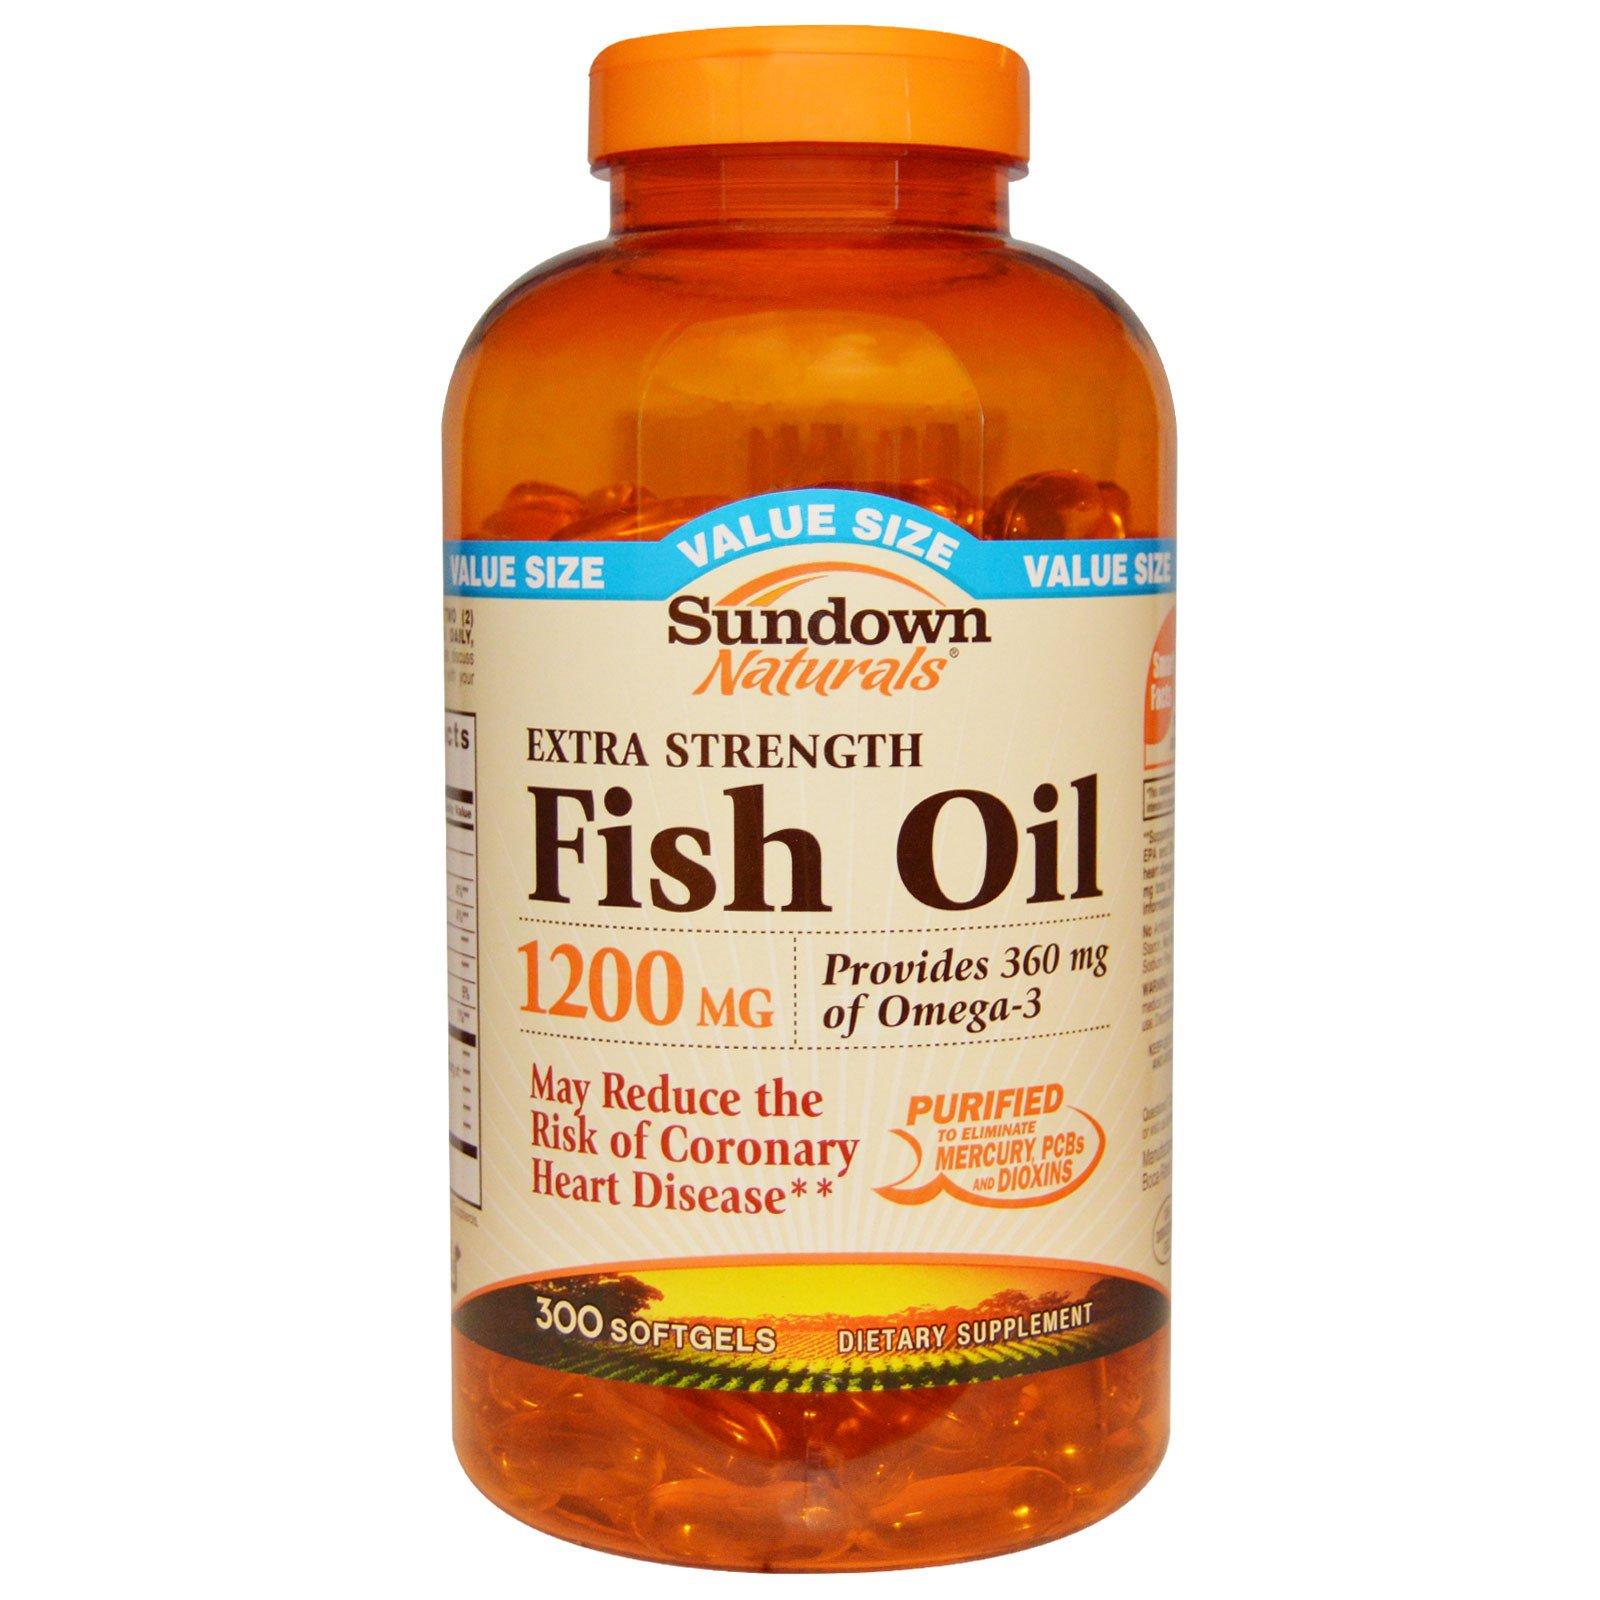 Sundown Naturals, Экстра сильный рыбий жир 1200 мг, 300 гелевых капсул